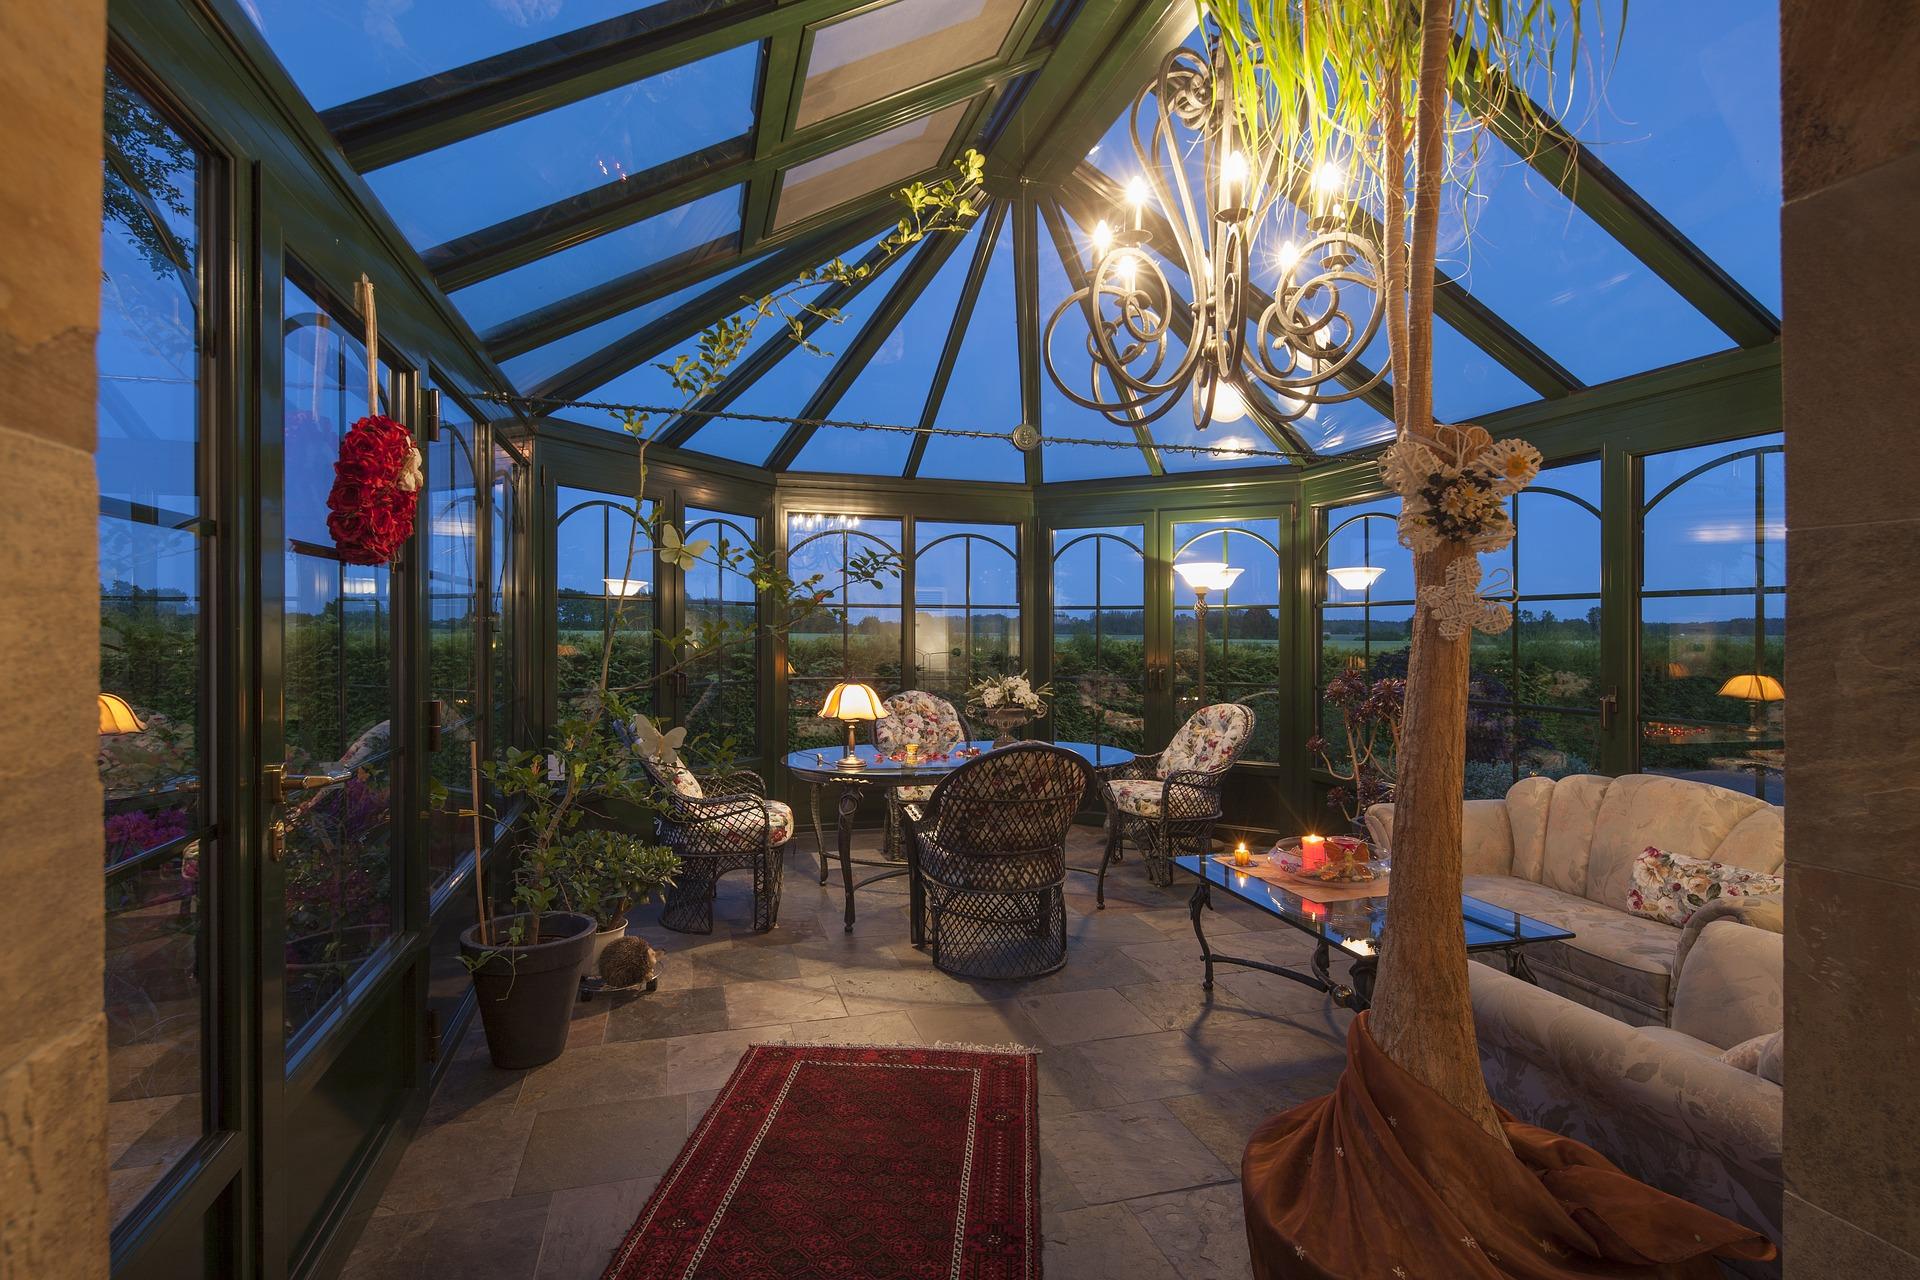 salon de jardin dans une veranda